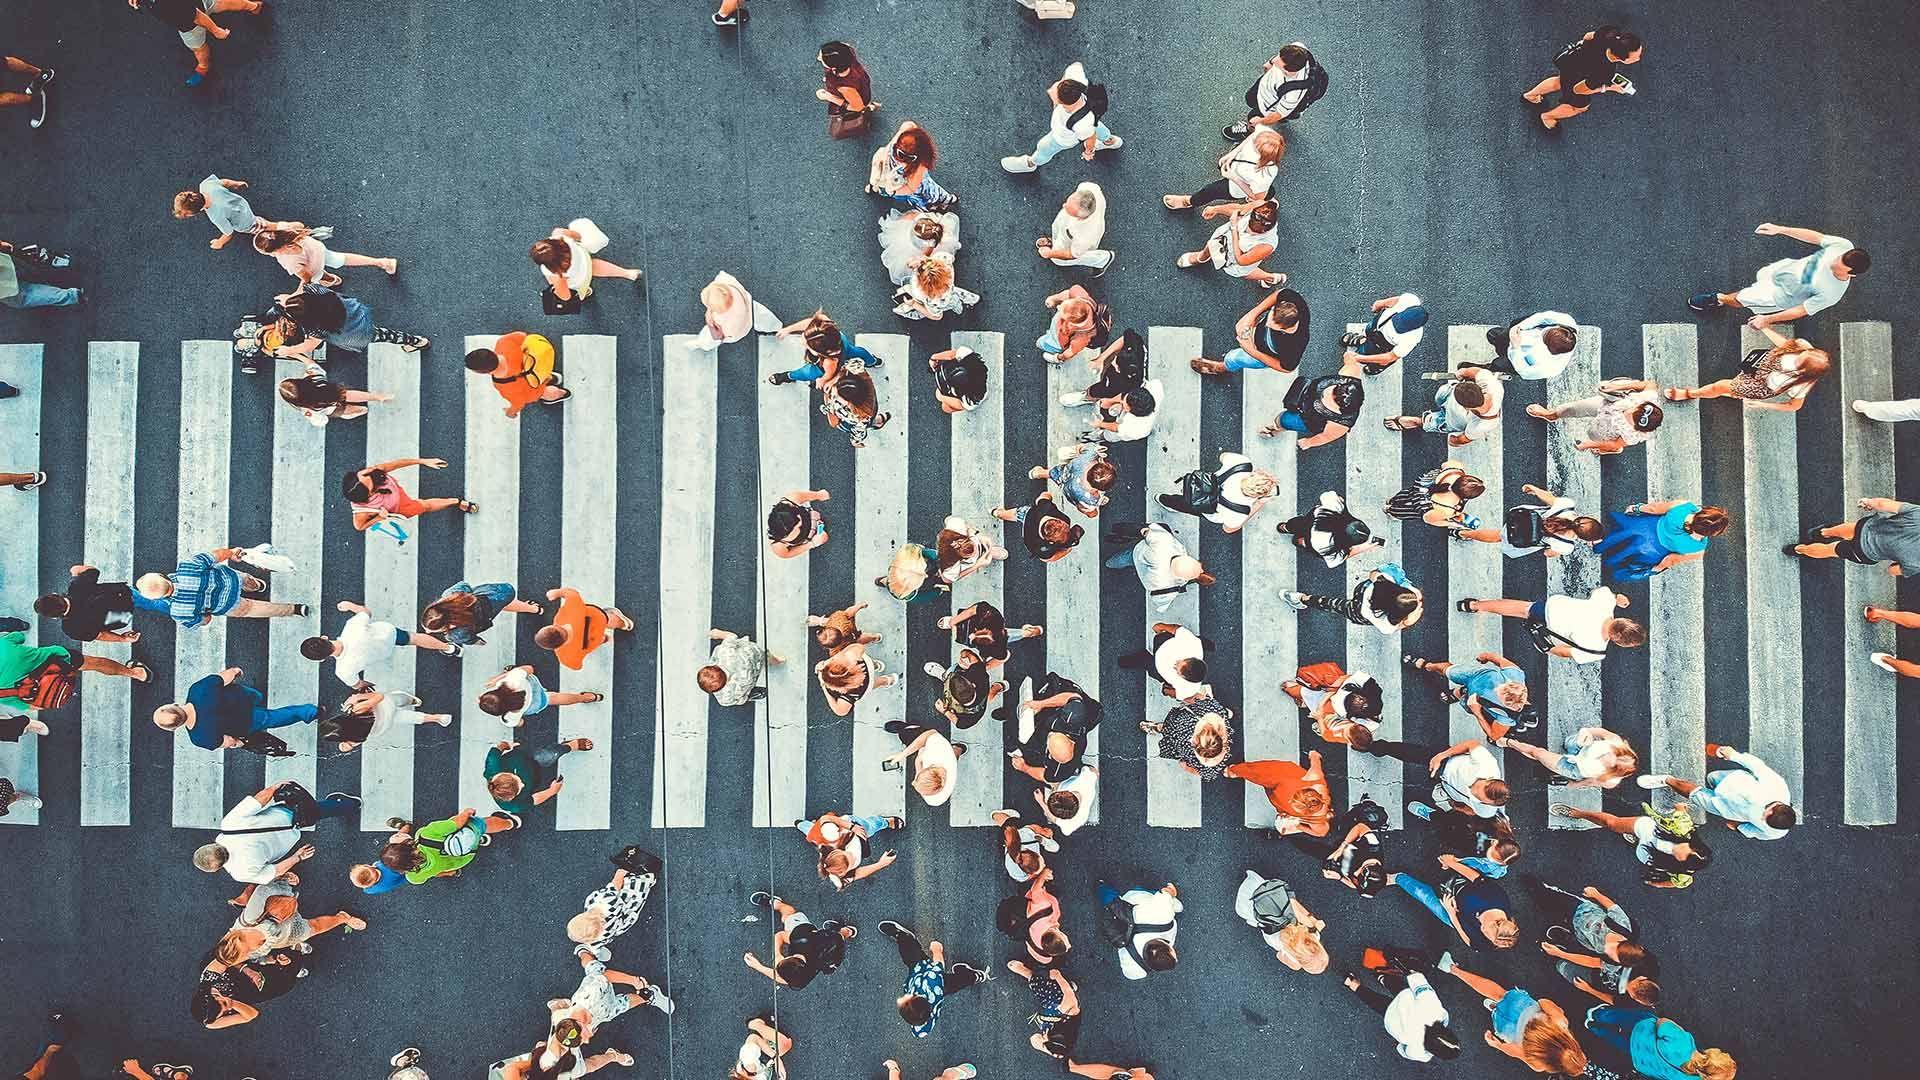 People crossing a road